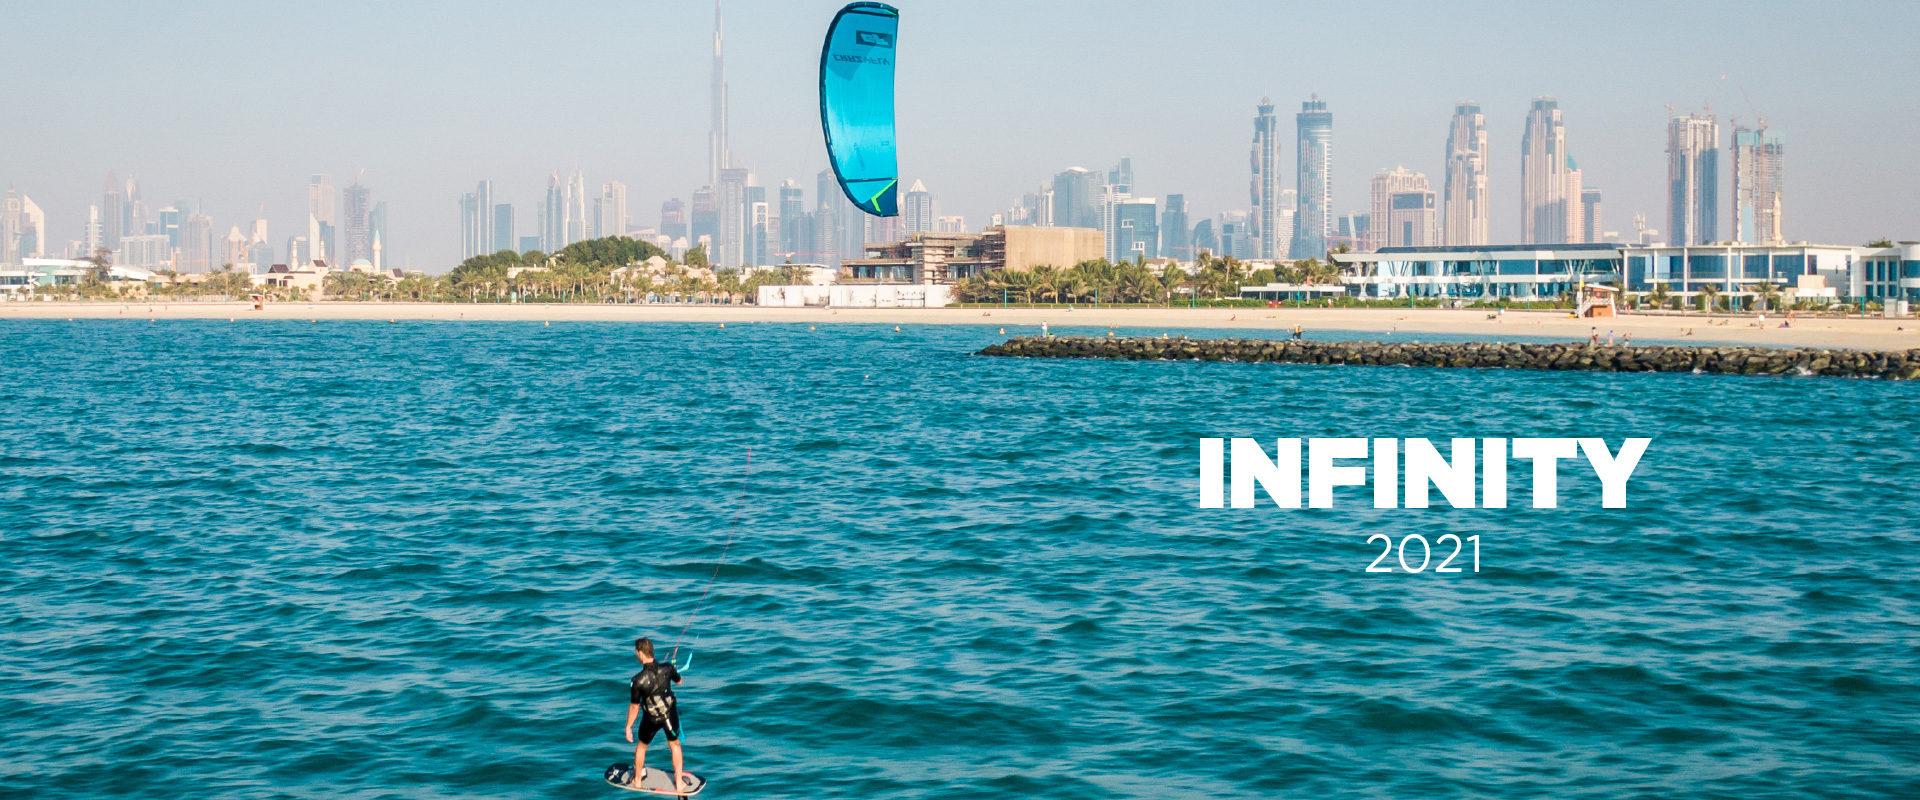 infinity slider 1920x800 - Home